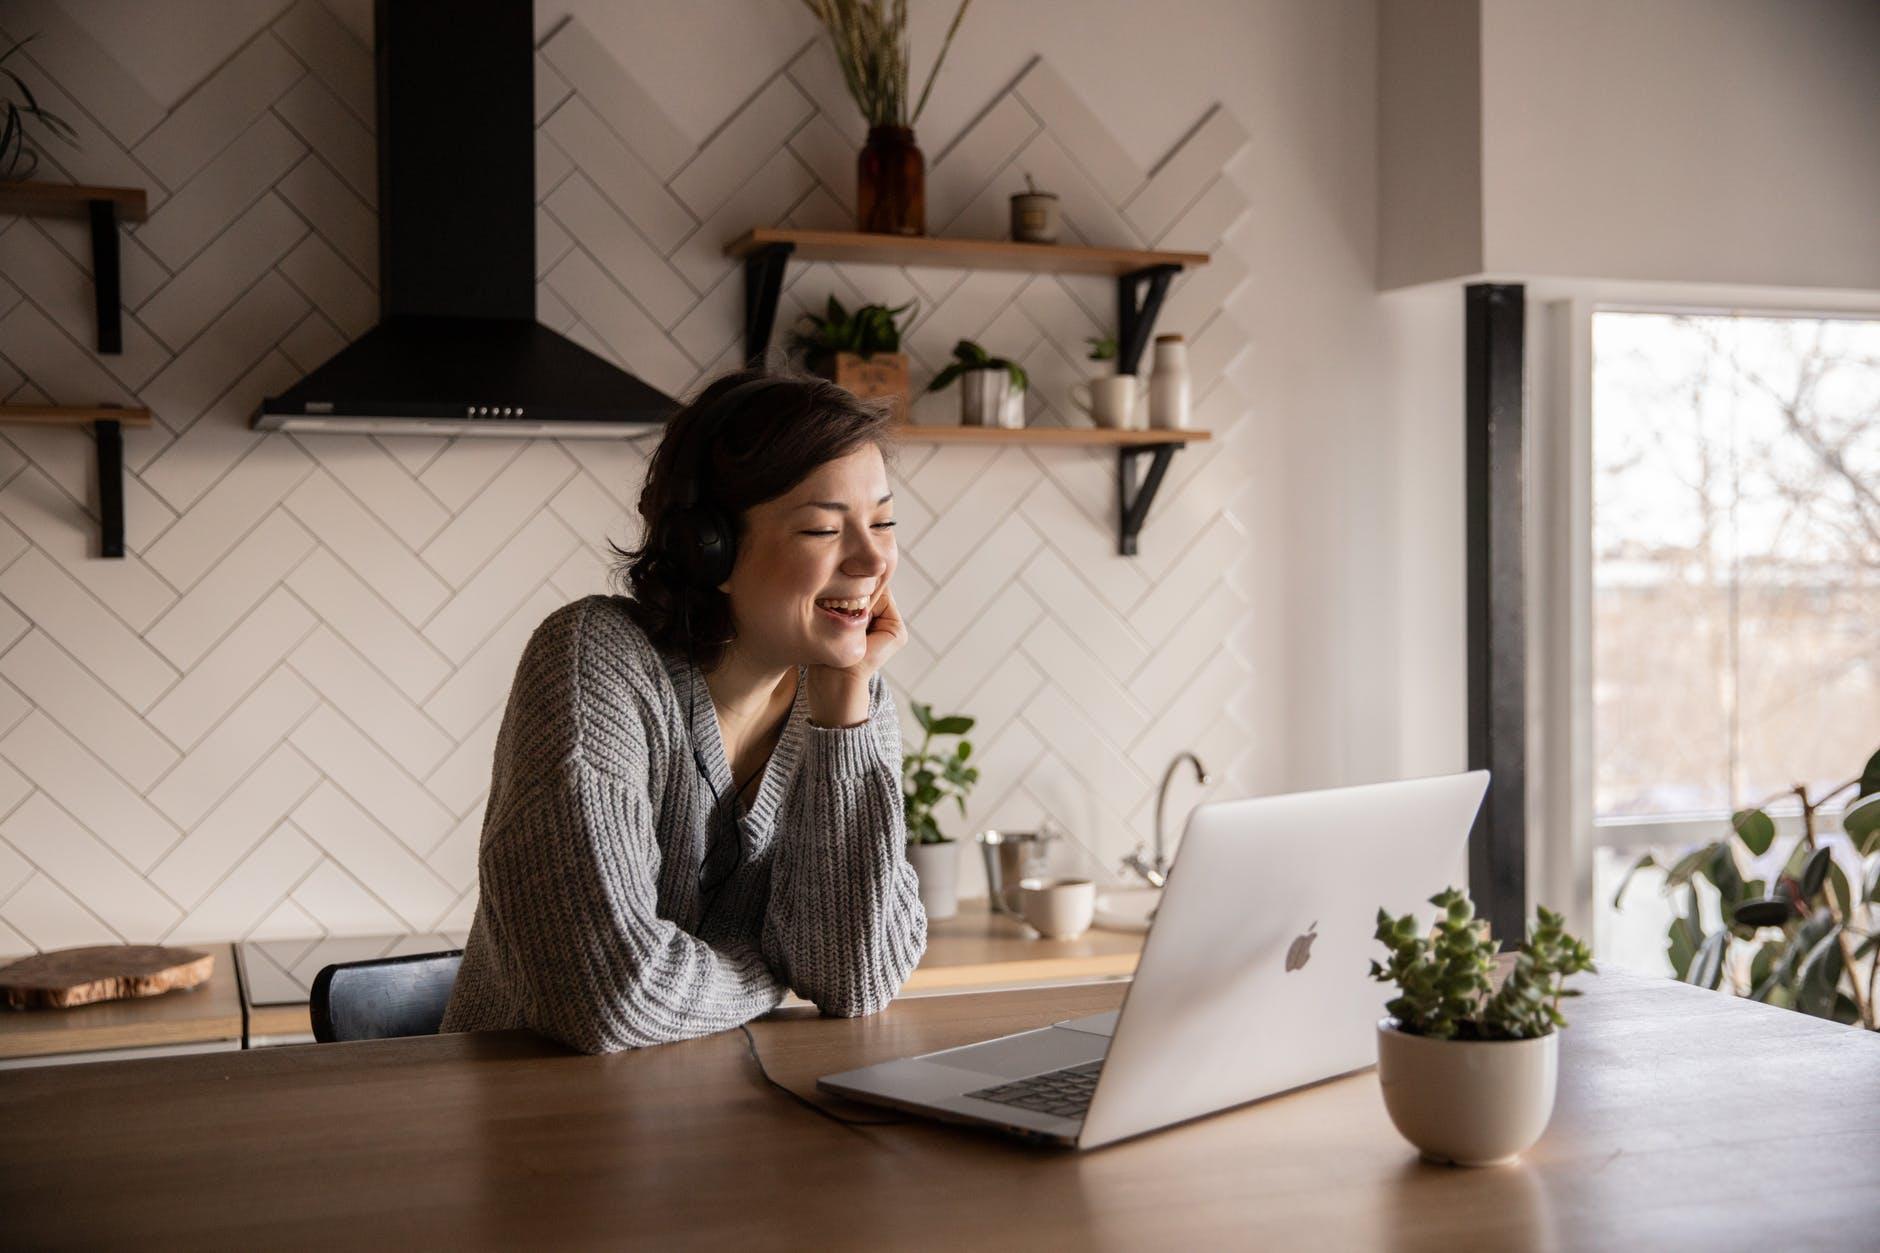 smiling woman talking via laptop in kitchen